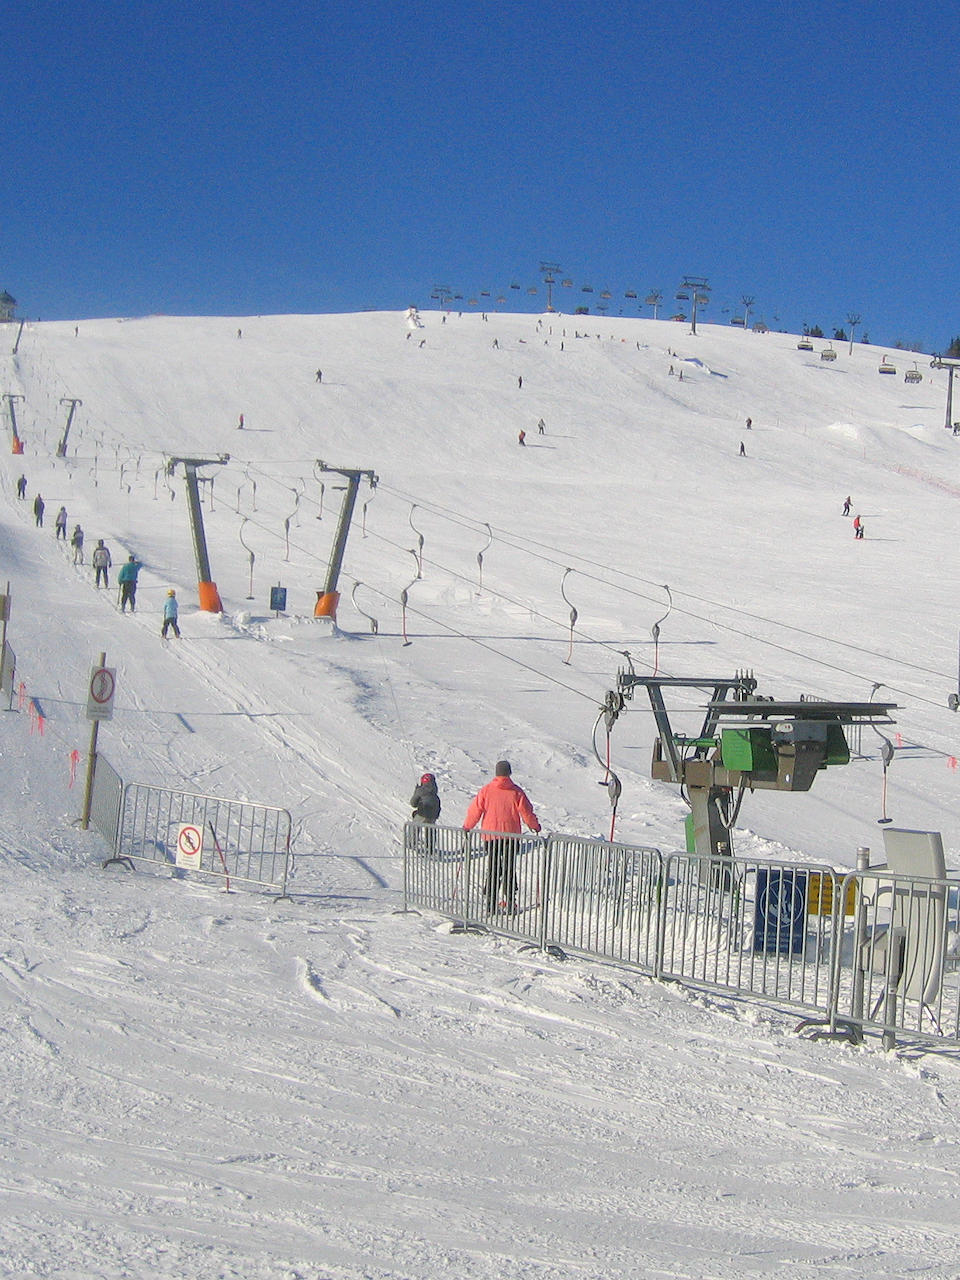 skilifte abfahrts skifahren im schwarzwald. Black Bedroom Furniture Sets. Home Design Ideas